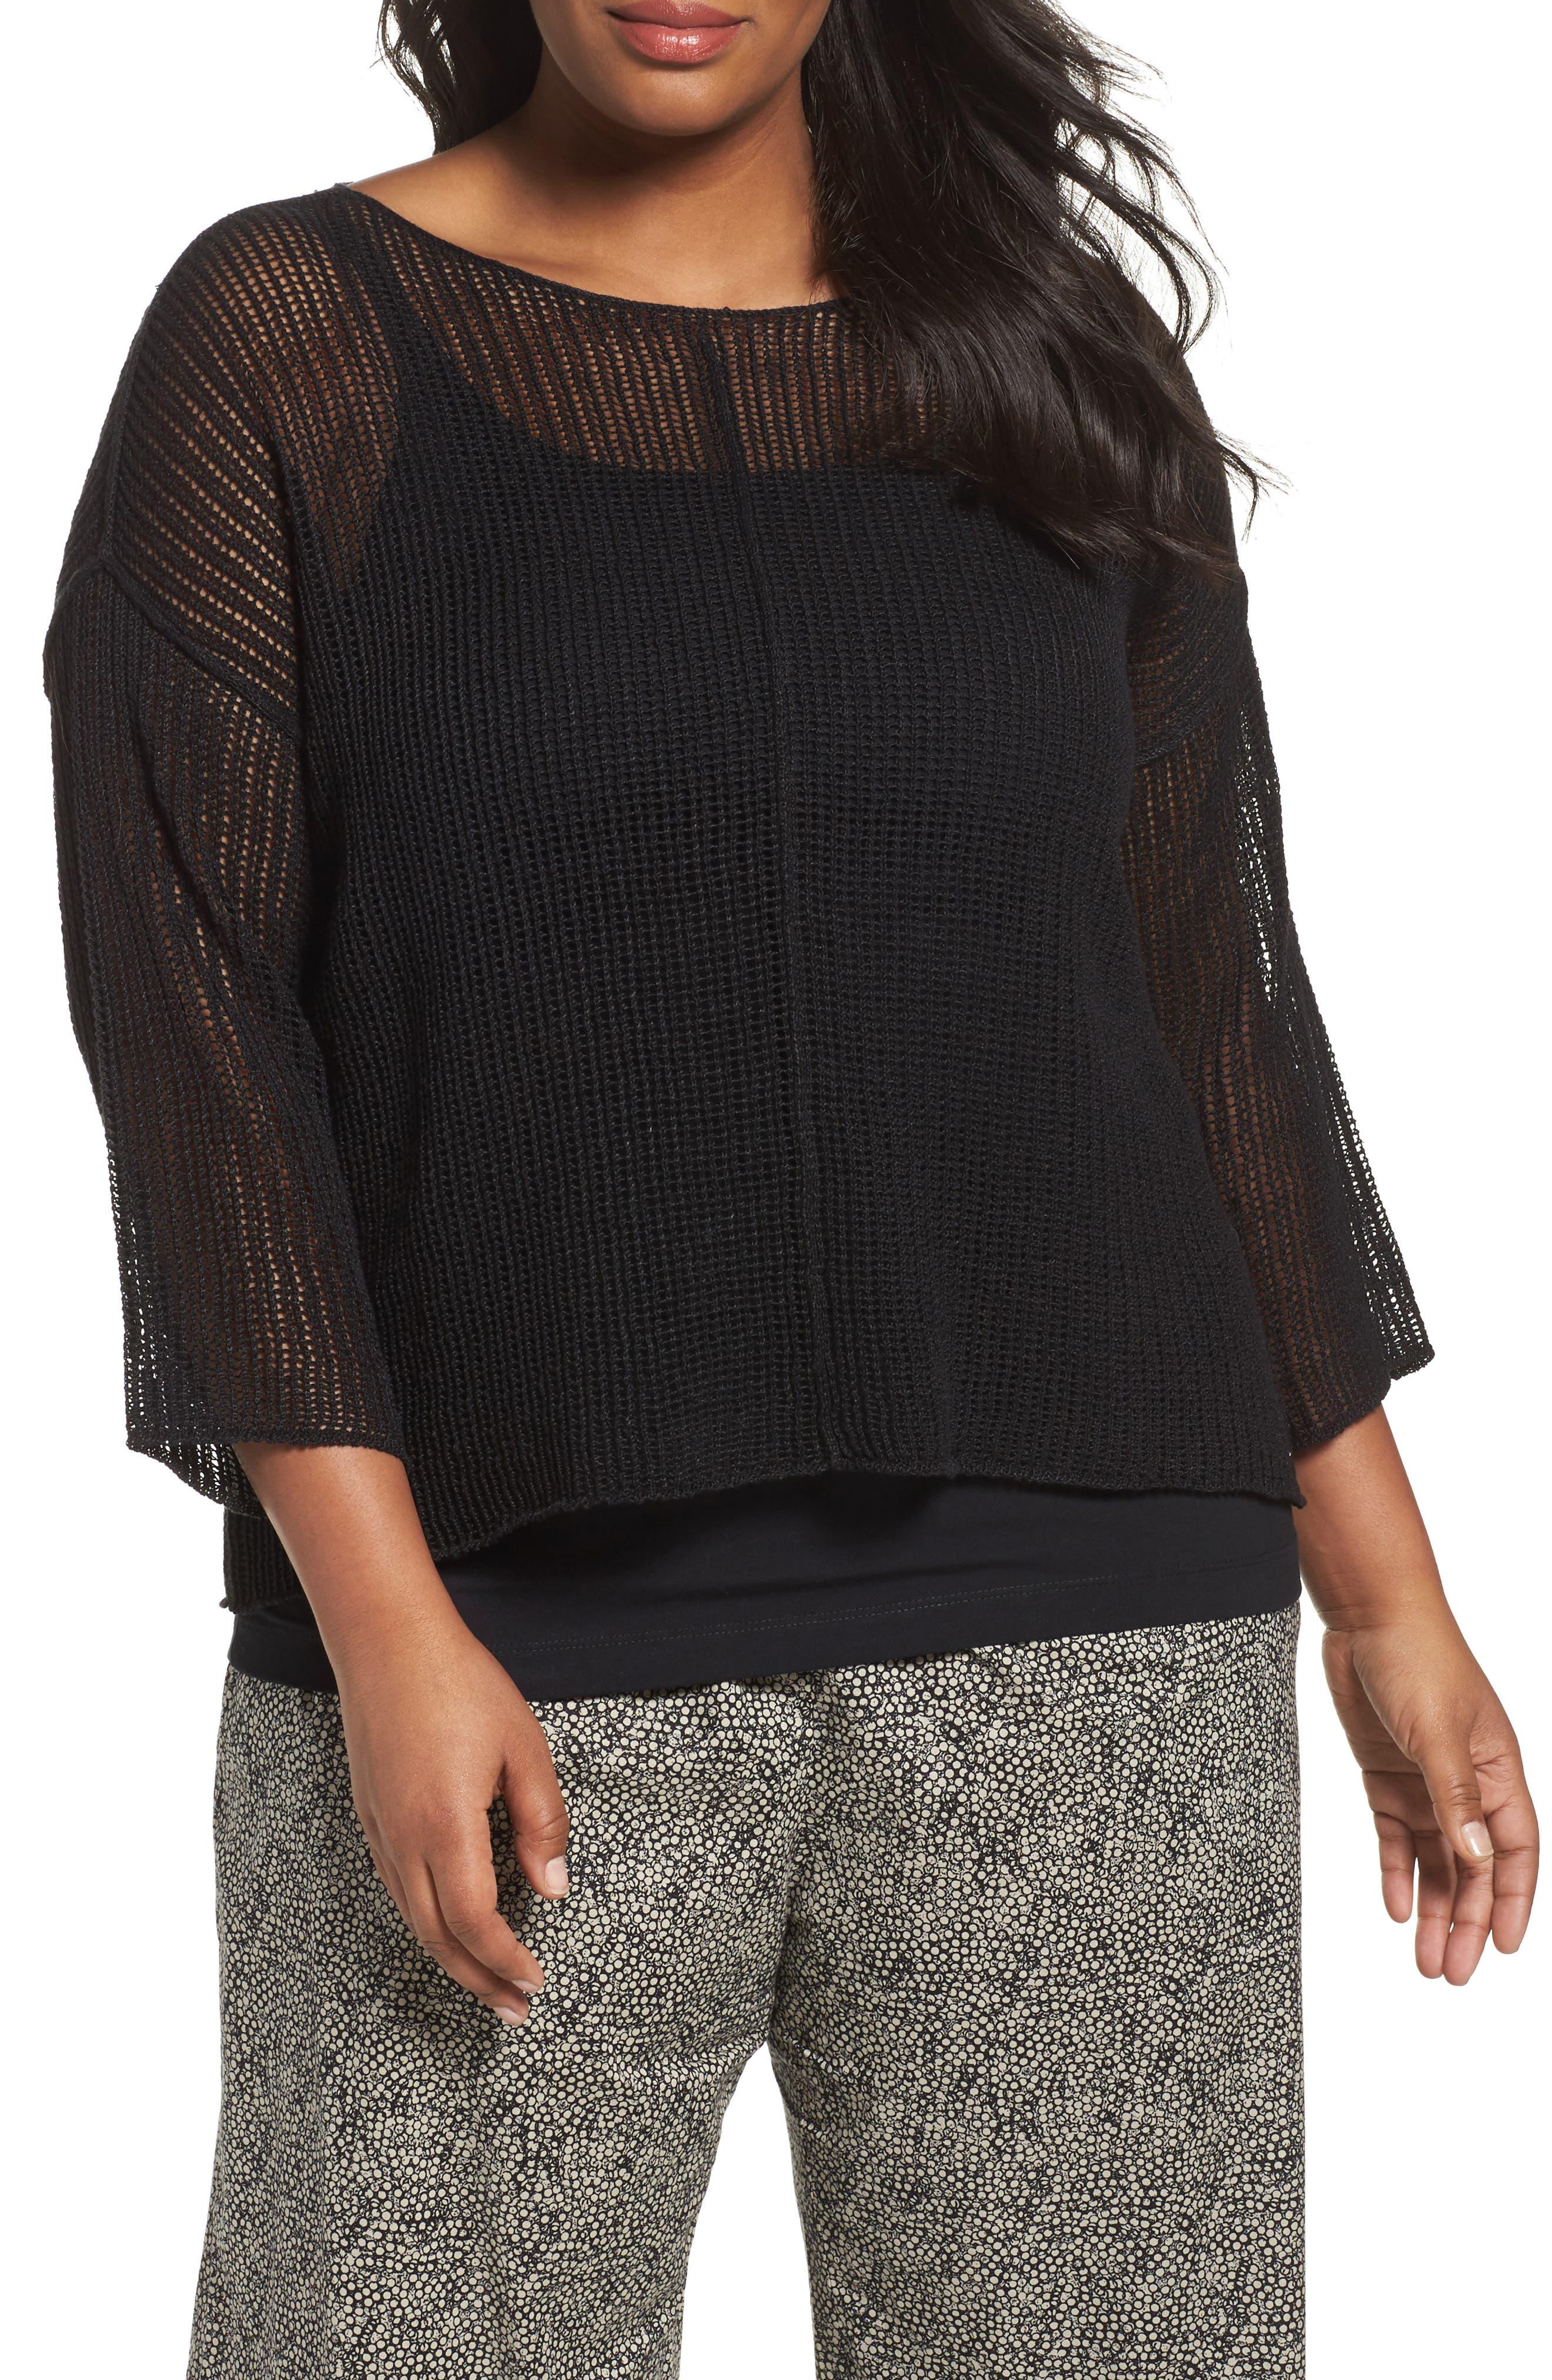 Organic Linen Mesh Knit Top,                         Main,                         color, Black